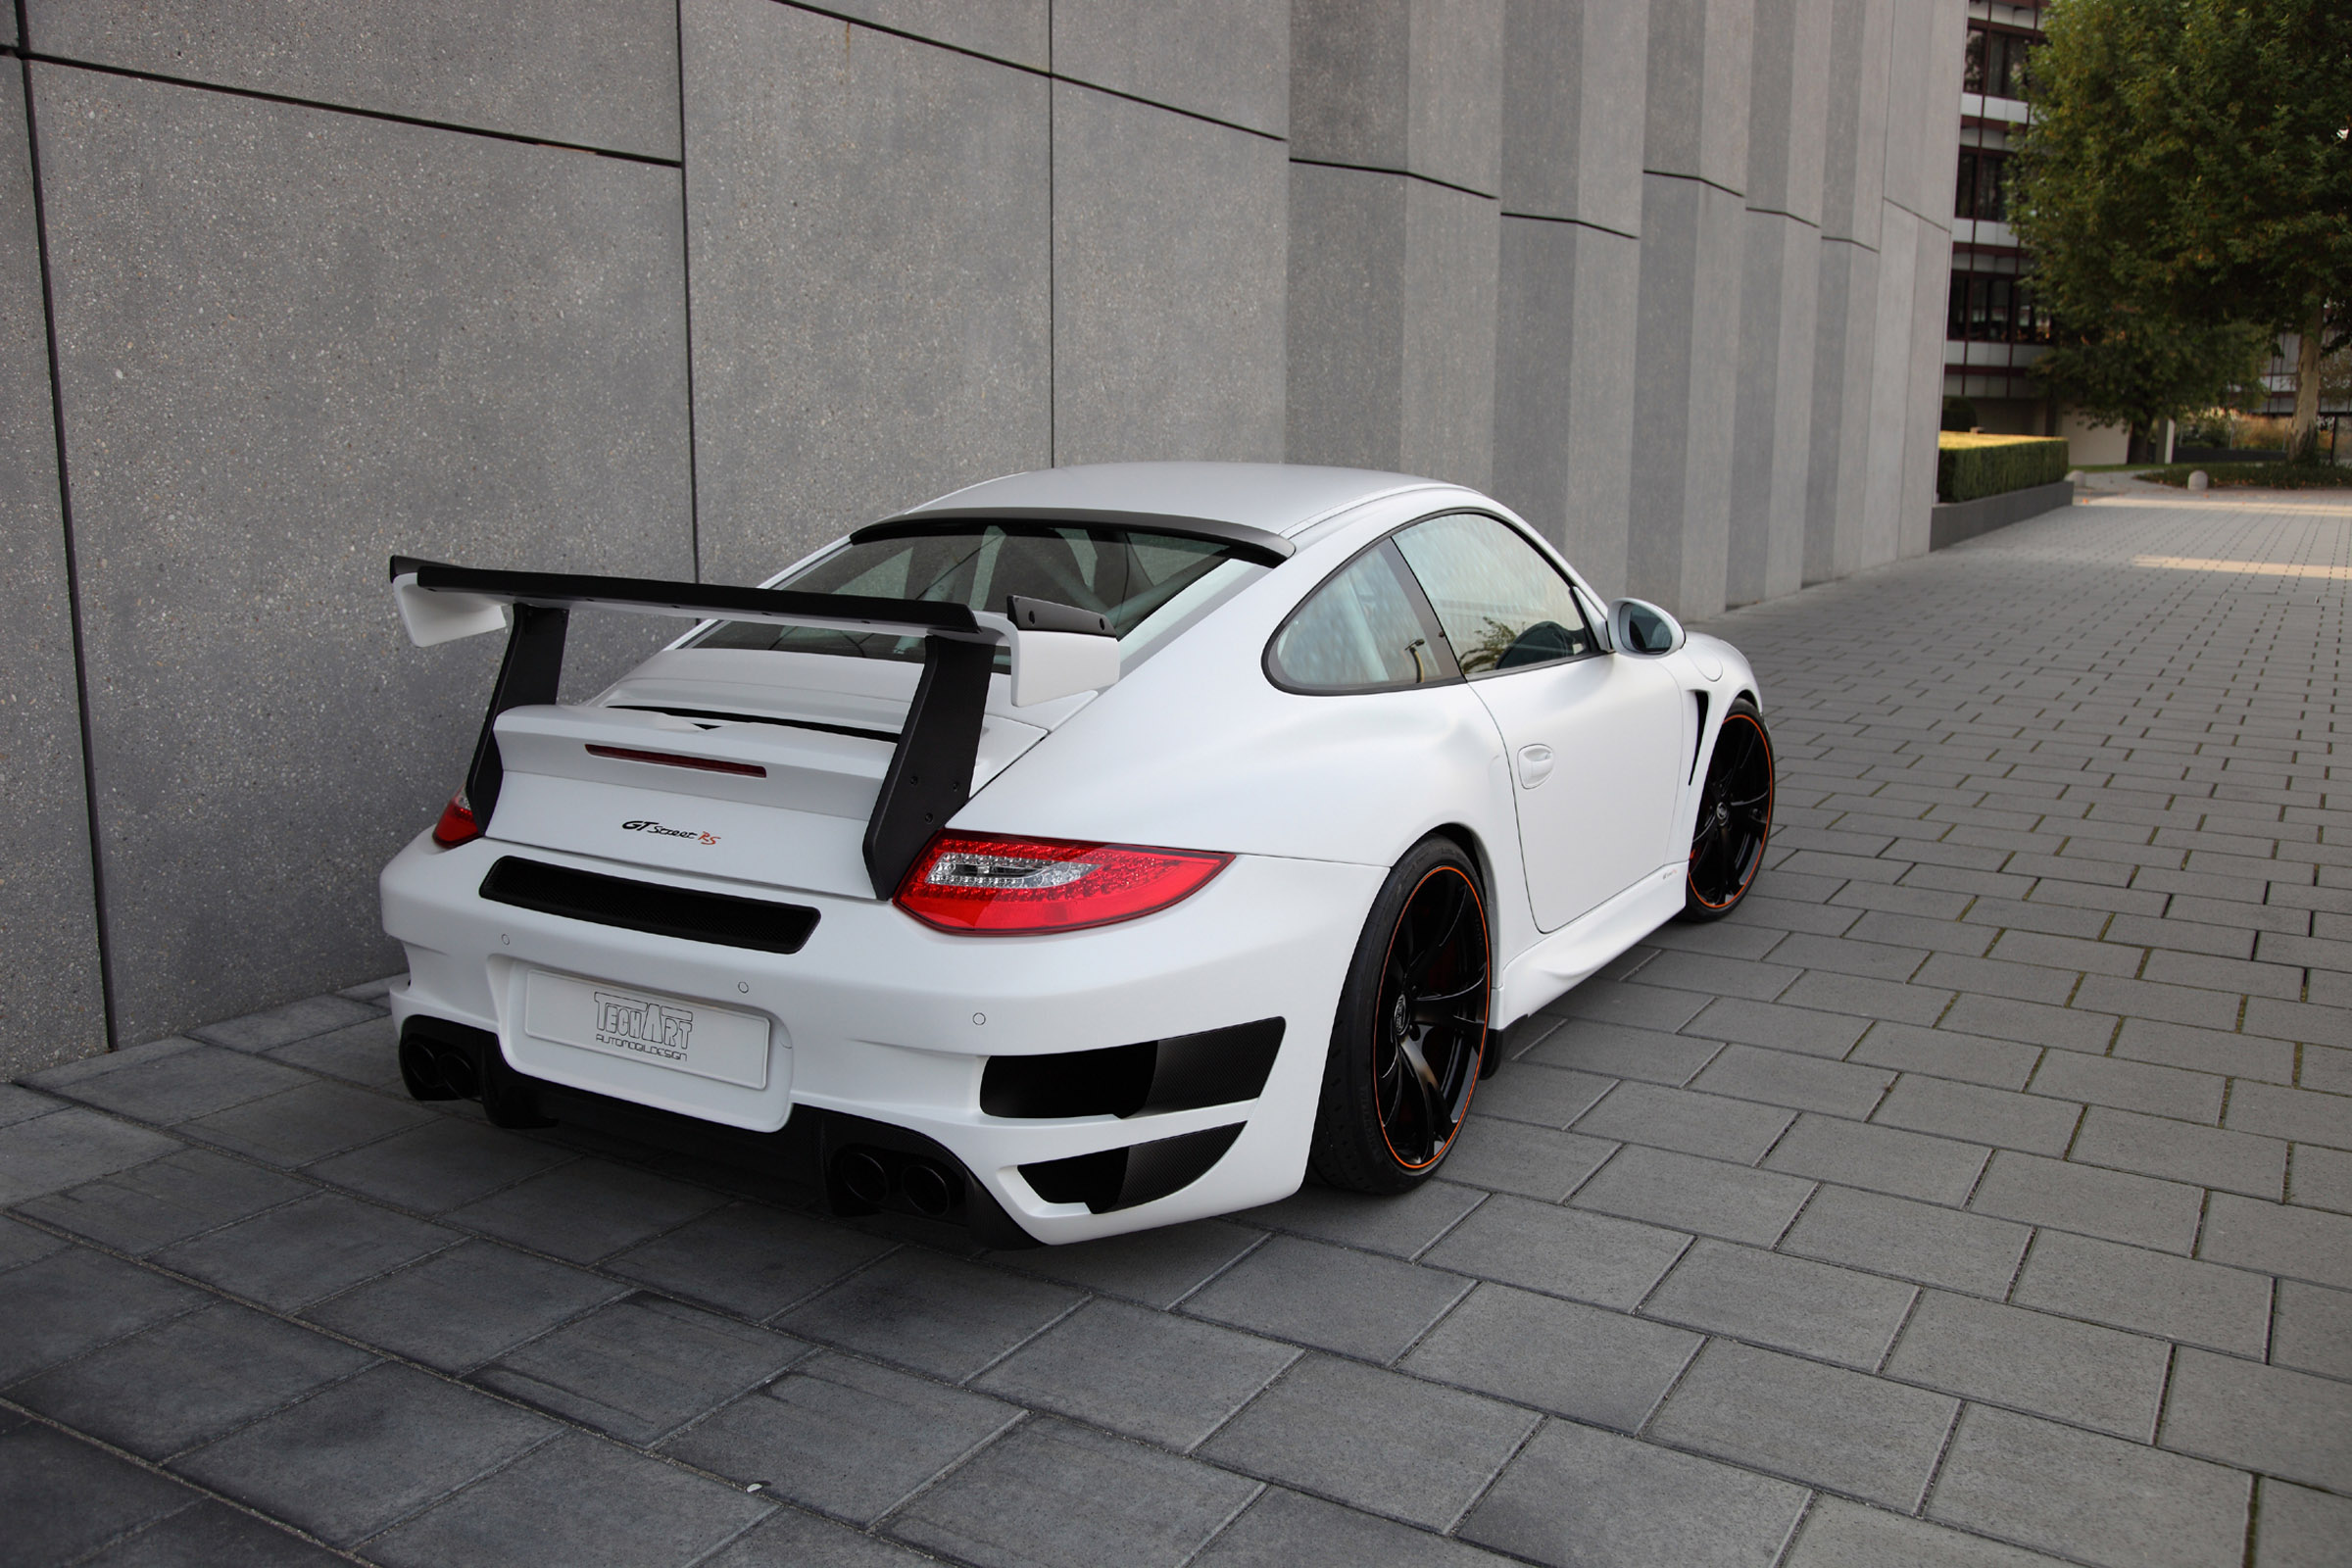 Techart Porsche Gt Street Rs In Frankfurt Video